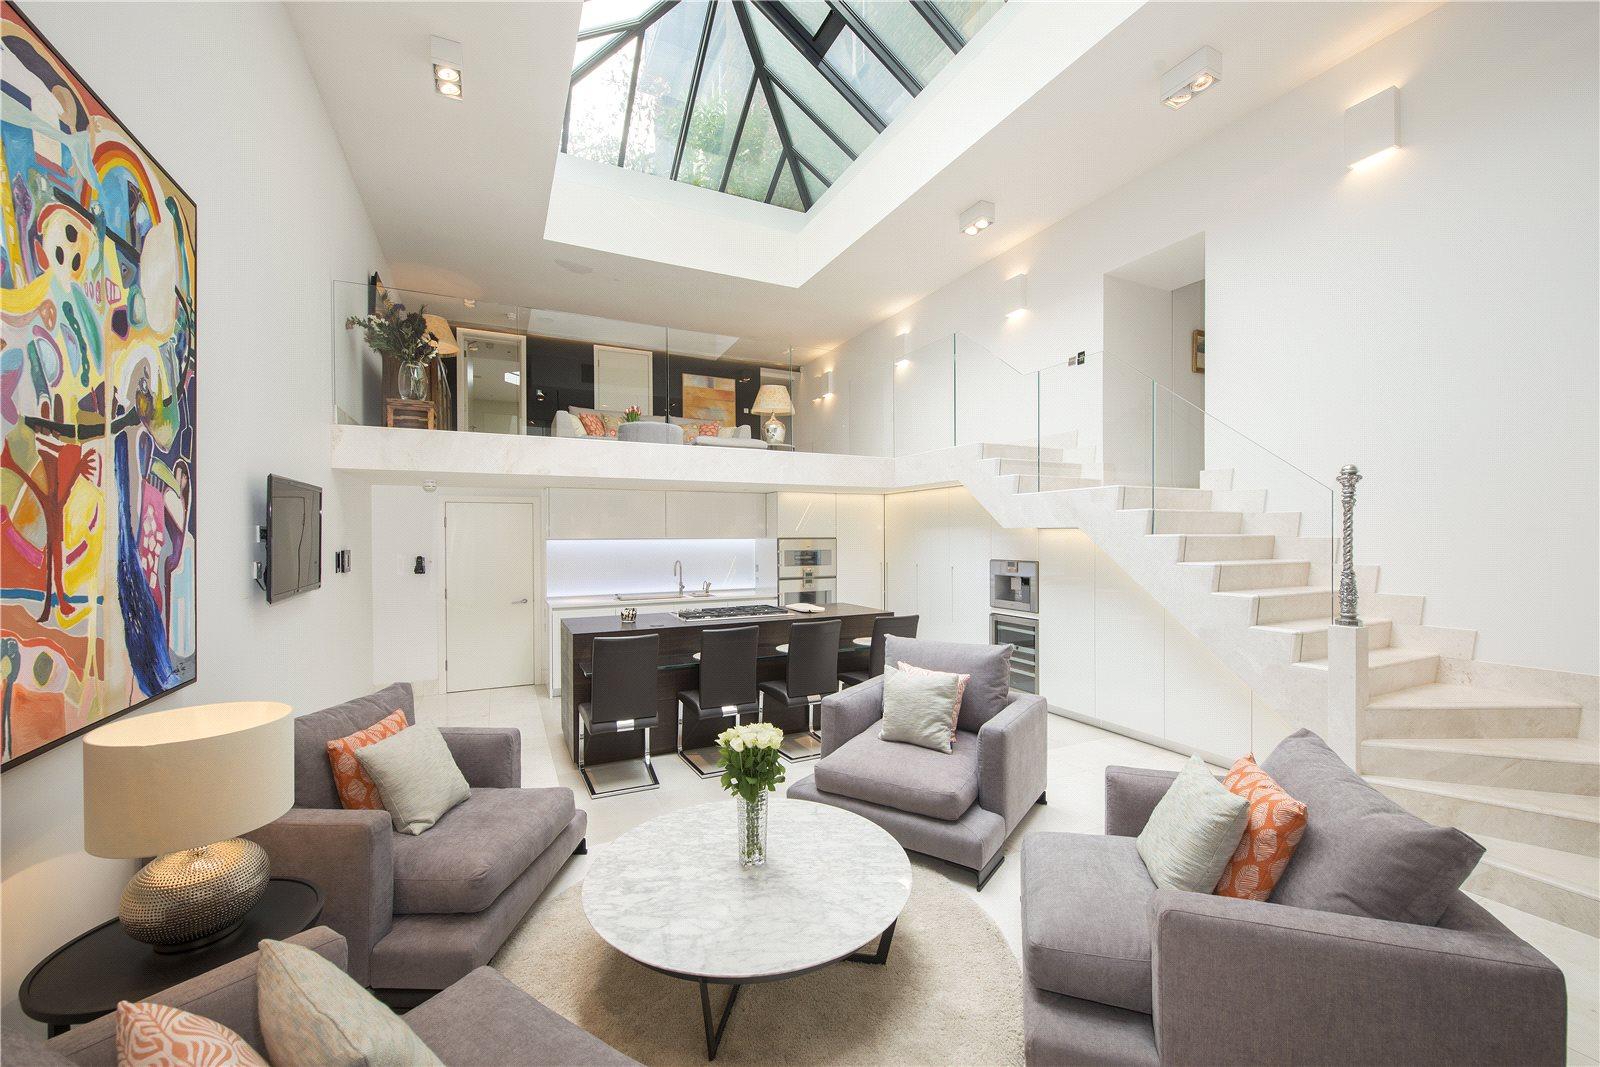 Apartments / Residences for Sale at Lansdowne House, Lansdowne Road, Holland Park, London, W11 Holland Park, London, England